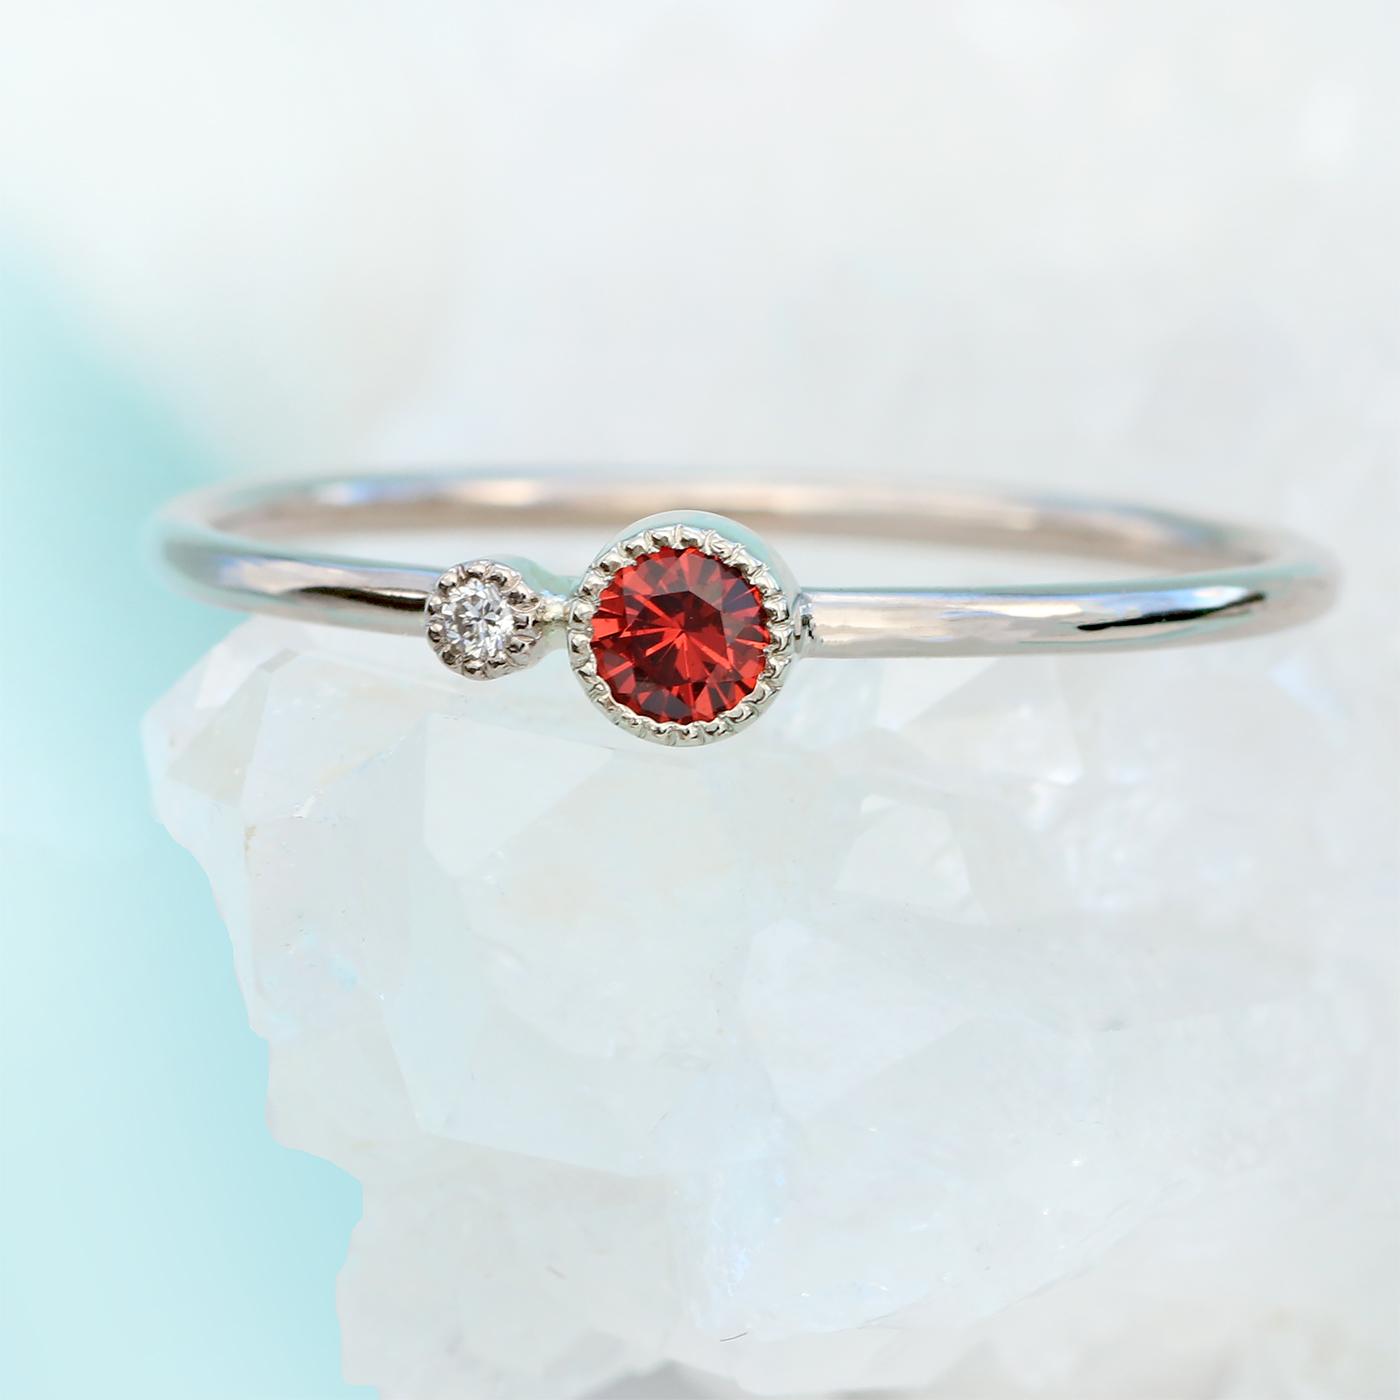 3247a6953f6c3a 18ct White Gold Garnet Birthstone Stacking Ring - Lilia Nash Jewellery